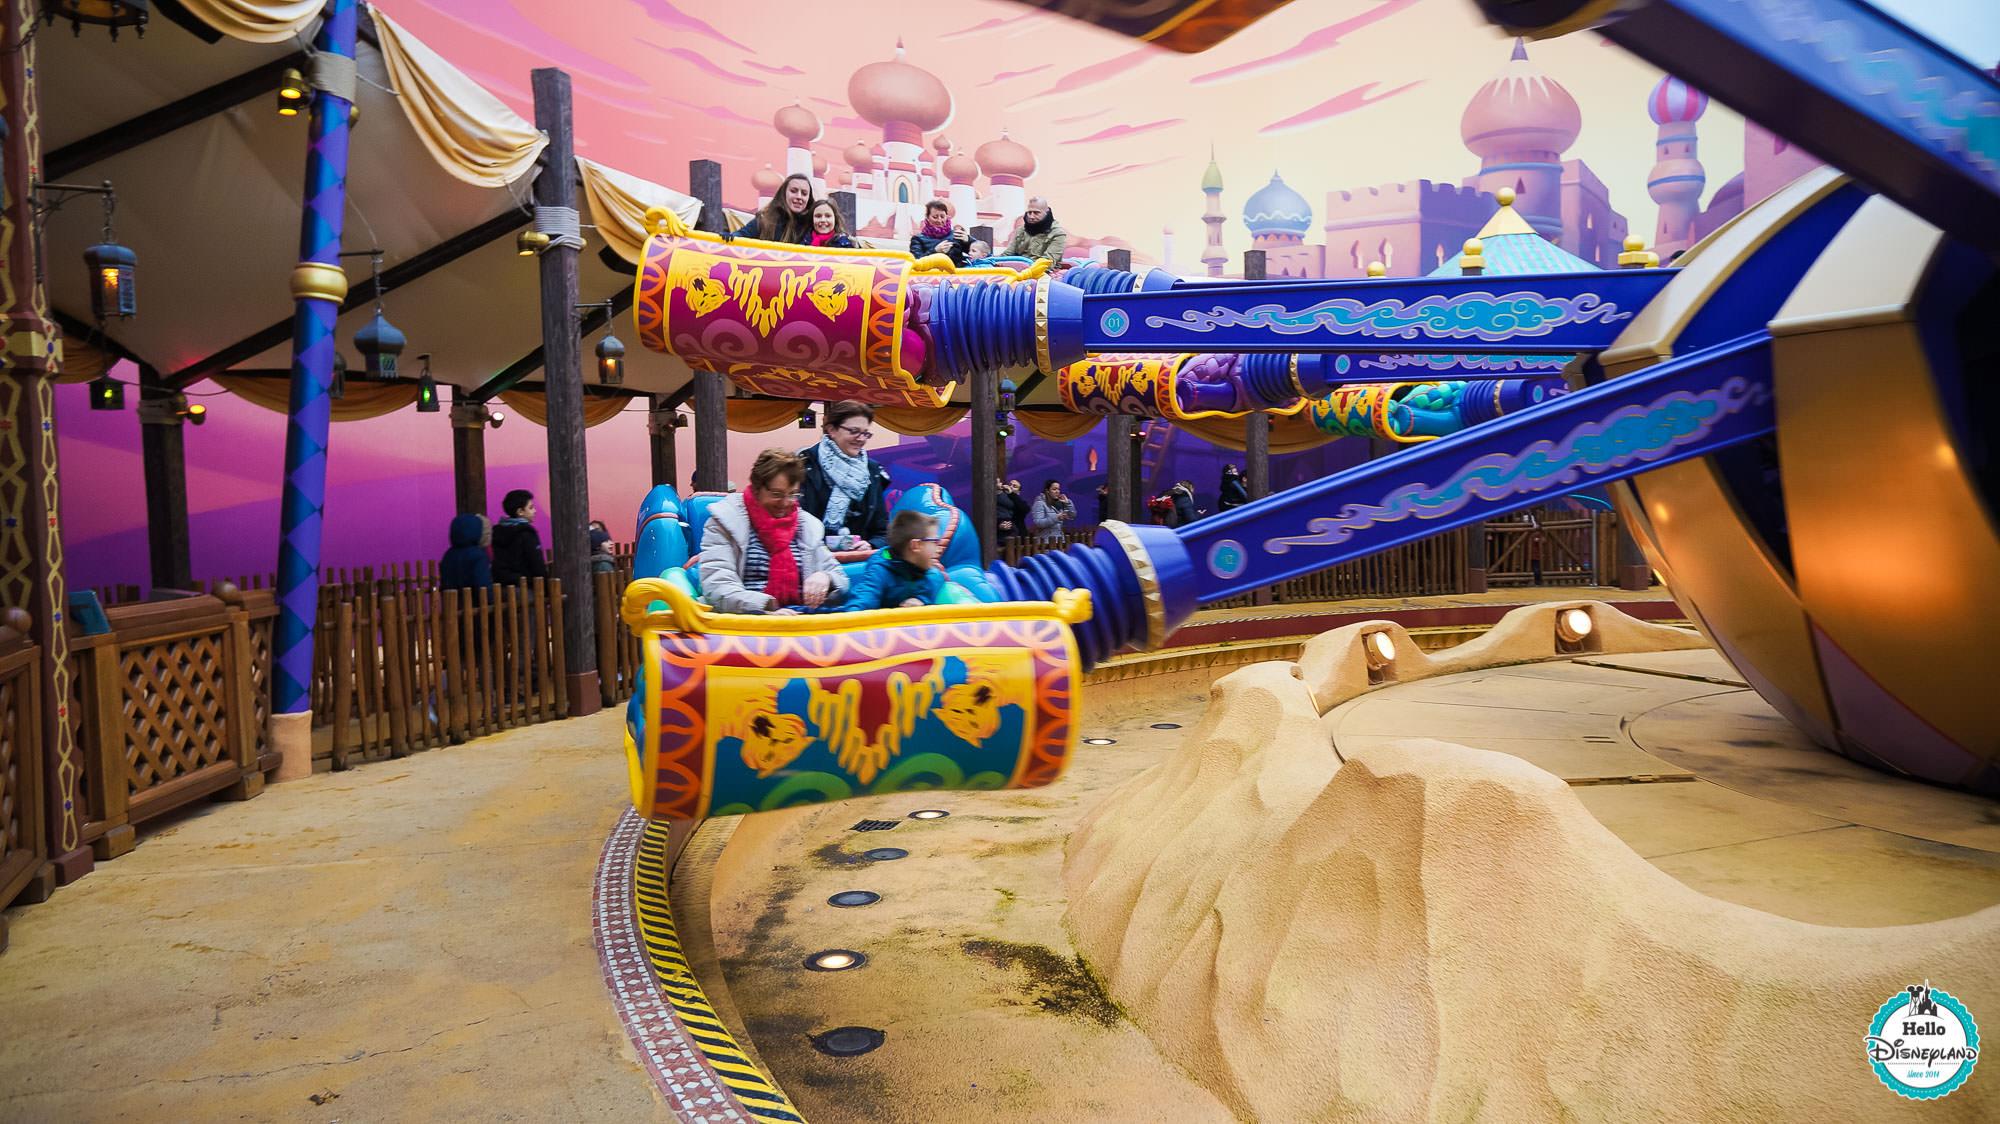 Hello Disneyland Le Blog N 176 1 Sur Disneyland Paris Les